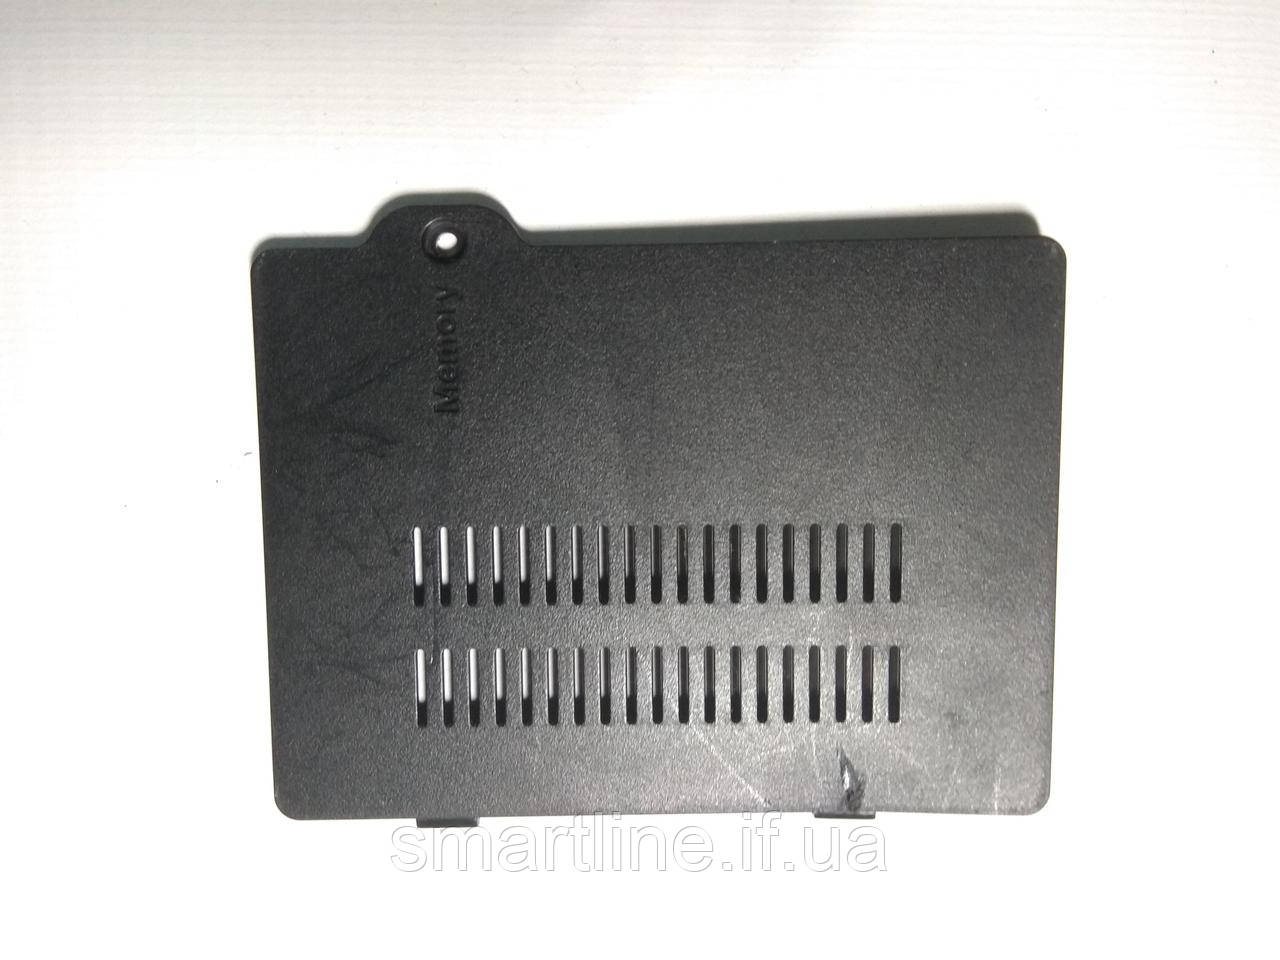 Сервісна кришка для ноутбука Samsung R60, BA81-04584A